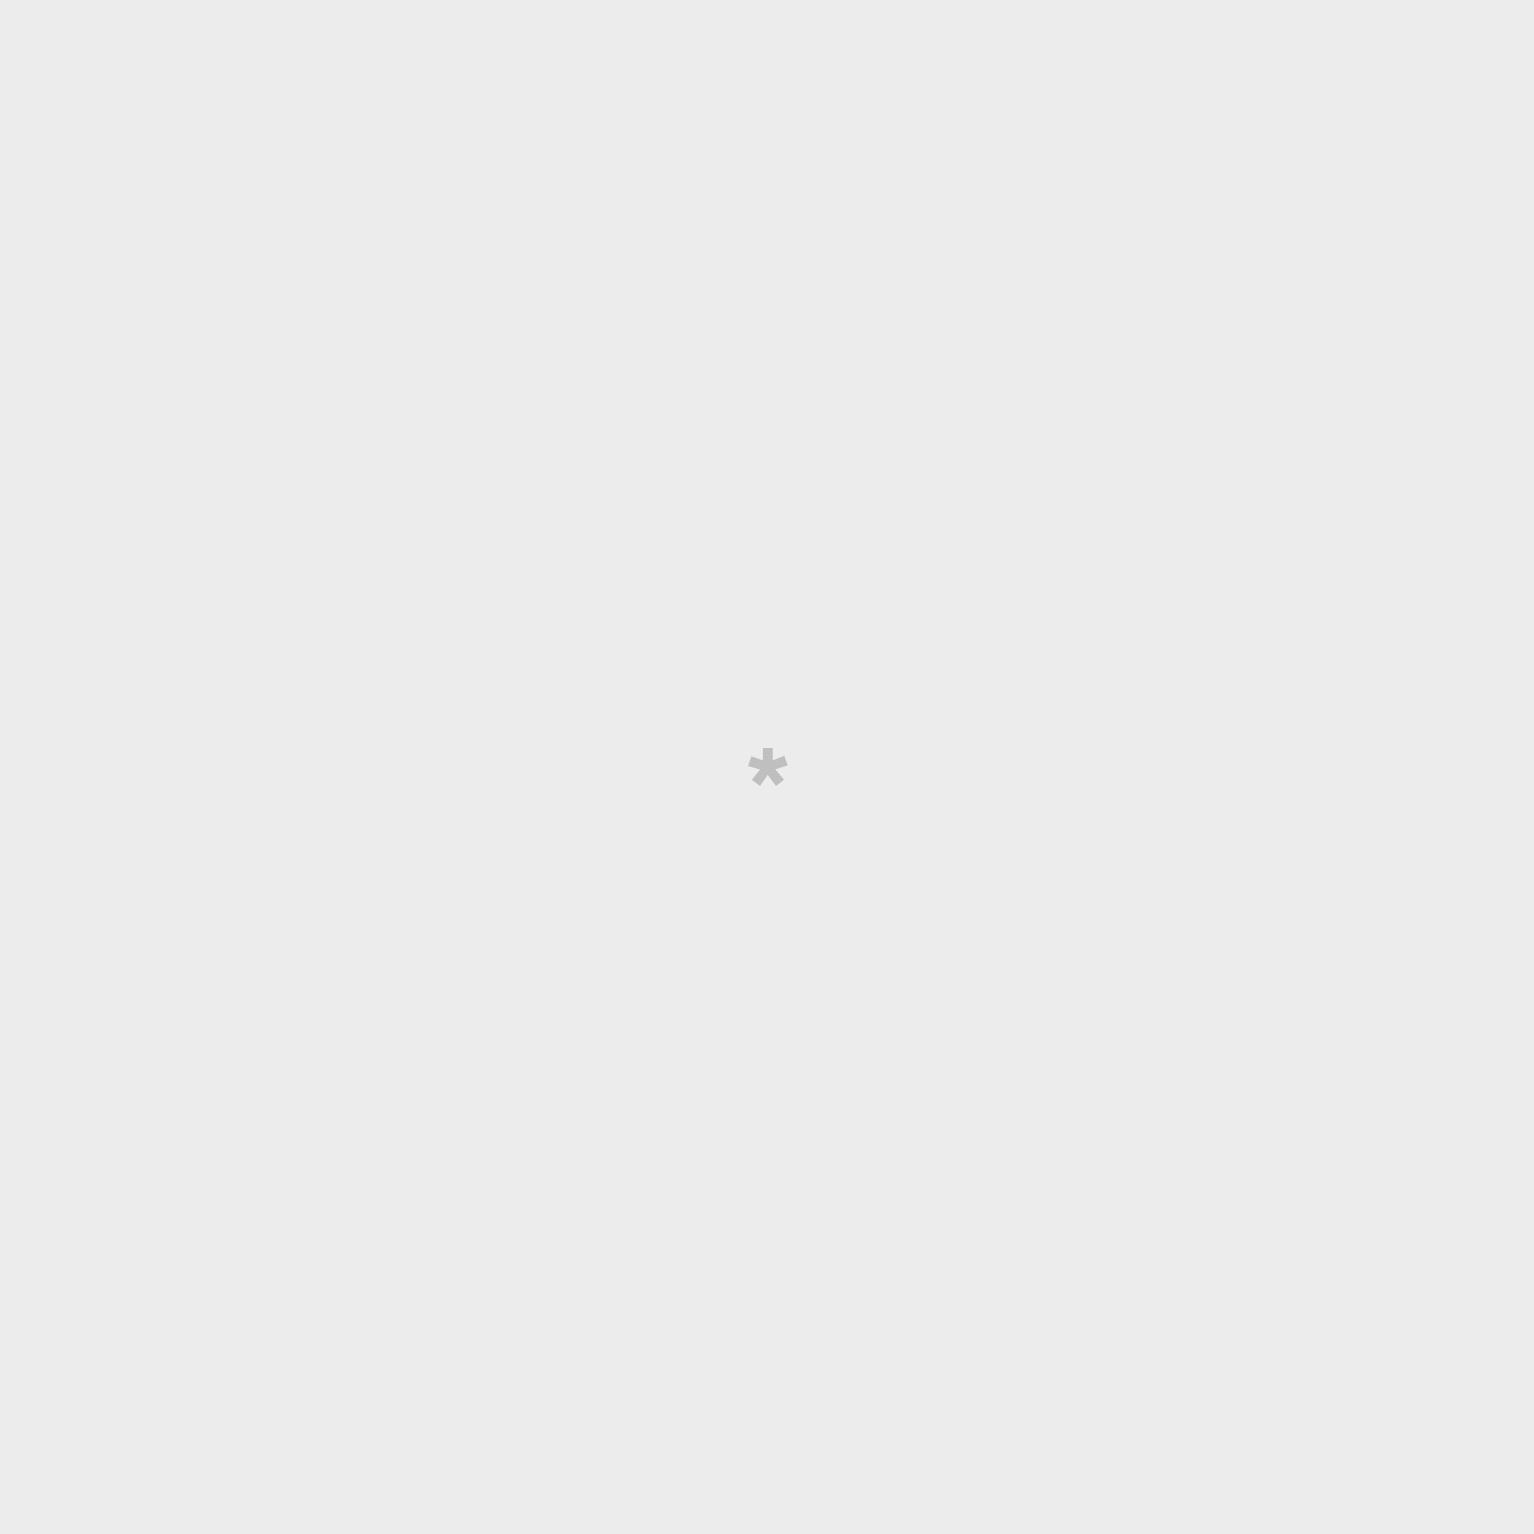 Manicure set - You nailed it!